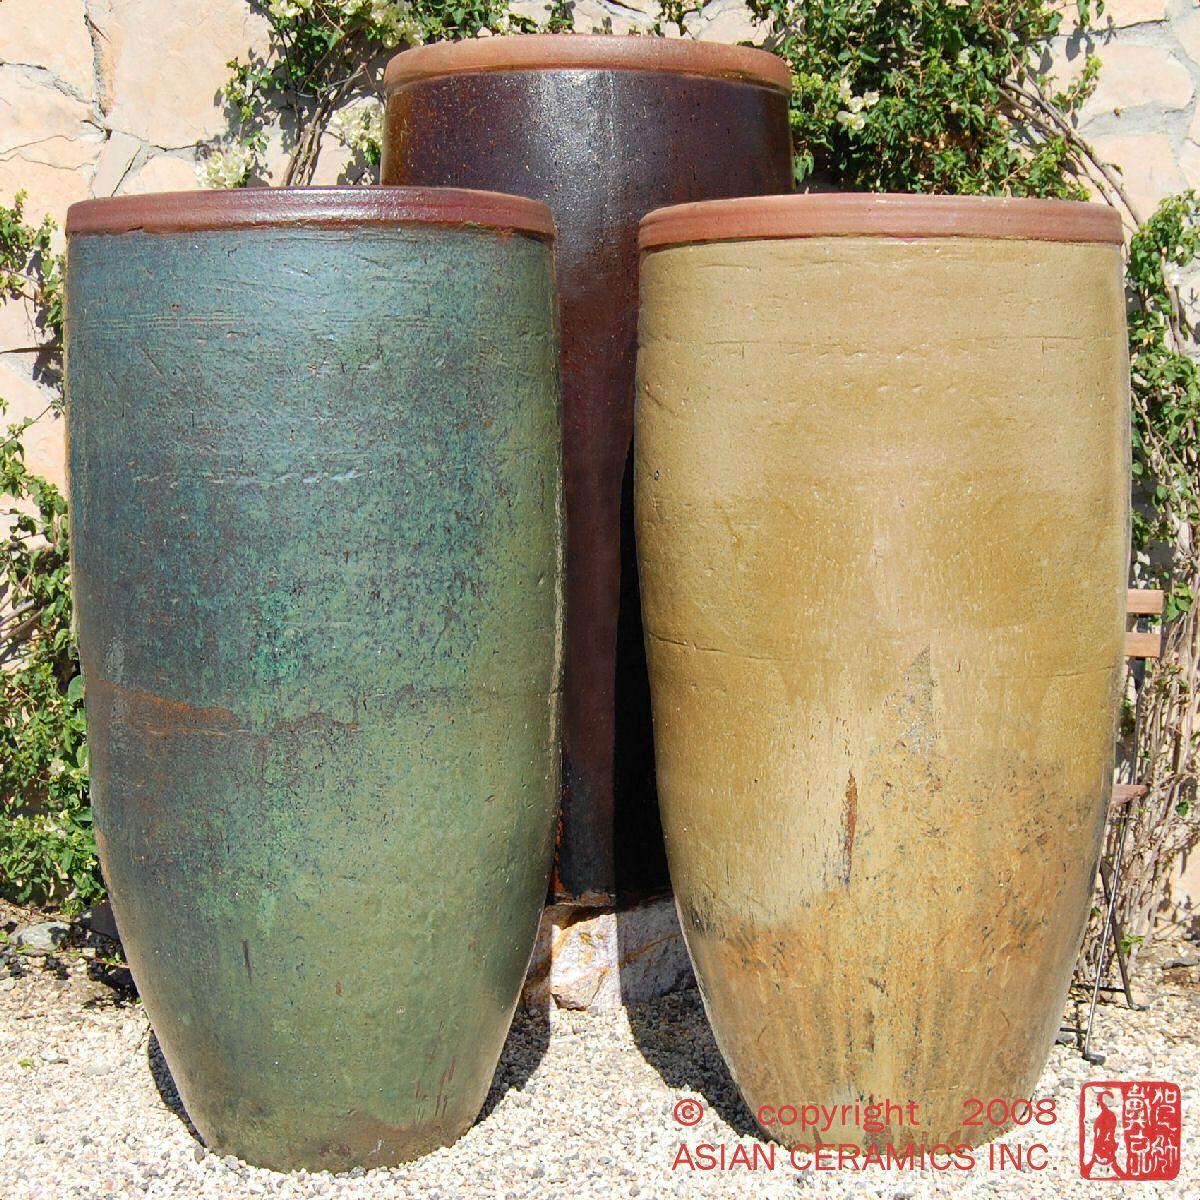 Tall Planters Tall Rustic Jar Large Tapered Planter Bronze Large Tapered Planter Large Garden Pots Large Ceramic Planters Tall Outdoor Planters